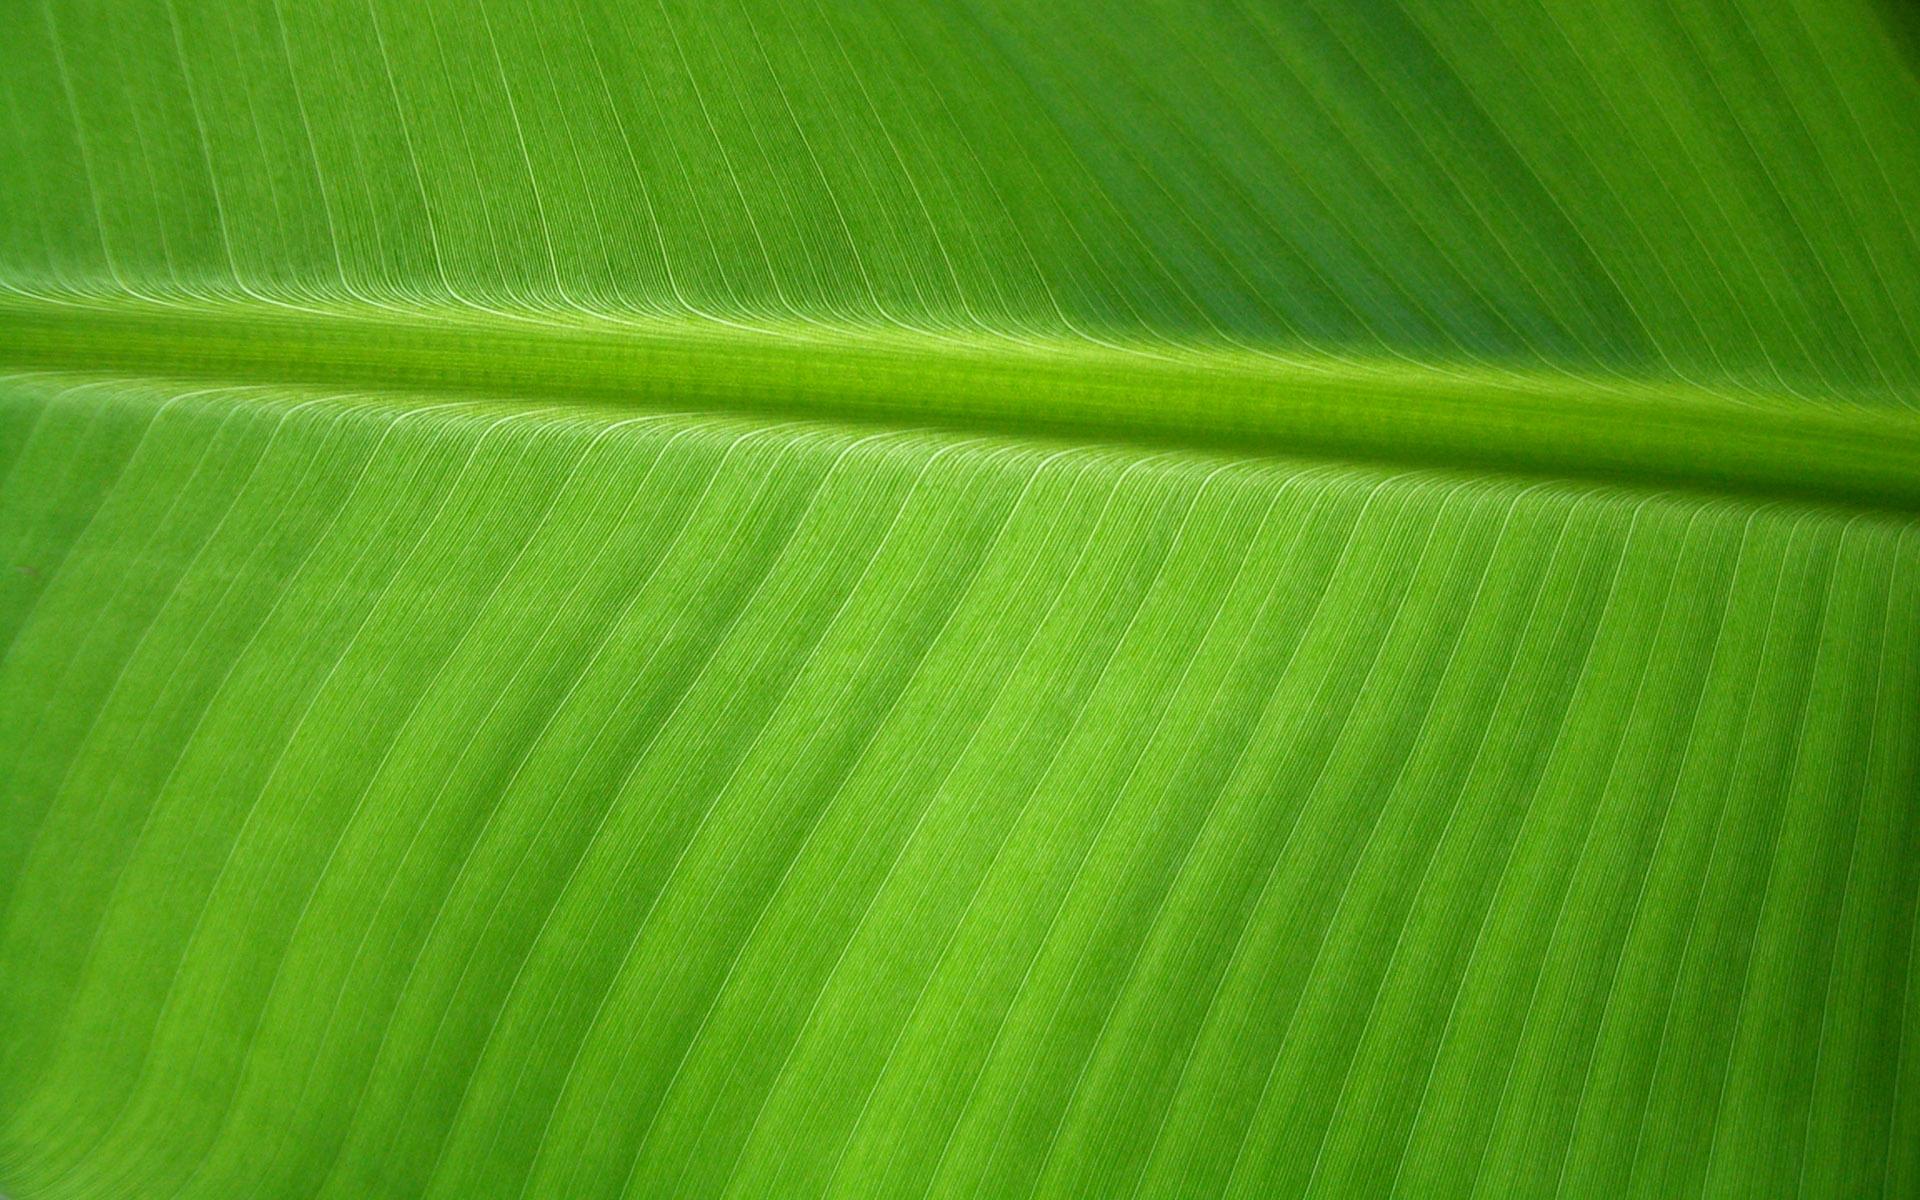 Banana Leaf by OrodrethC 1920x1200